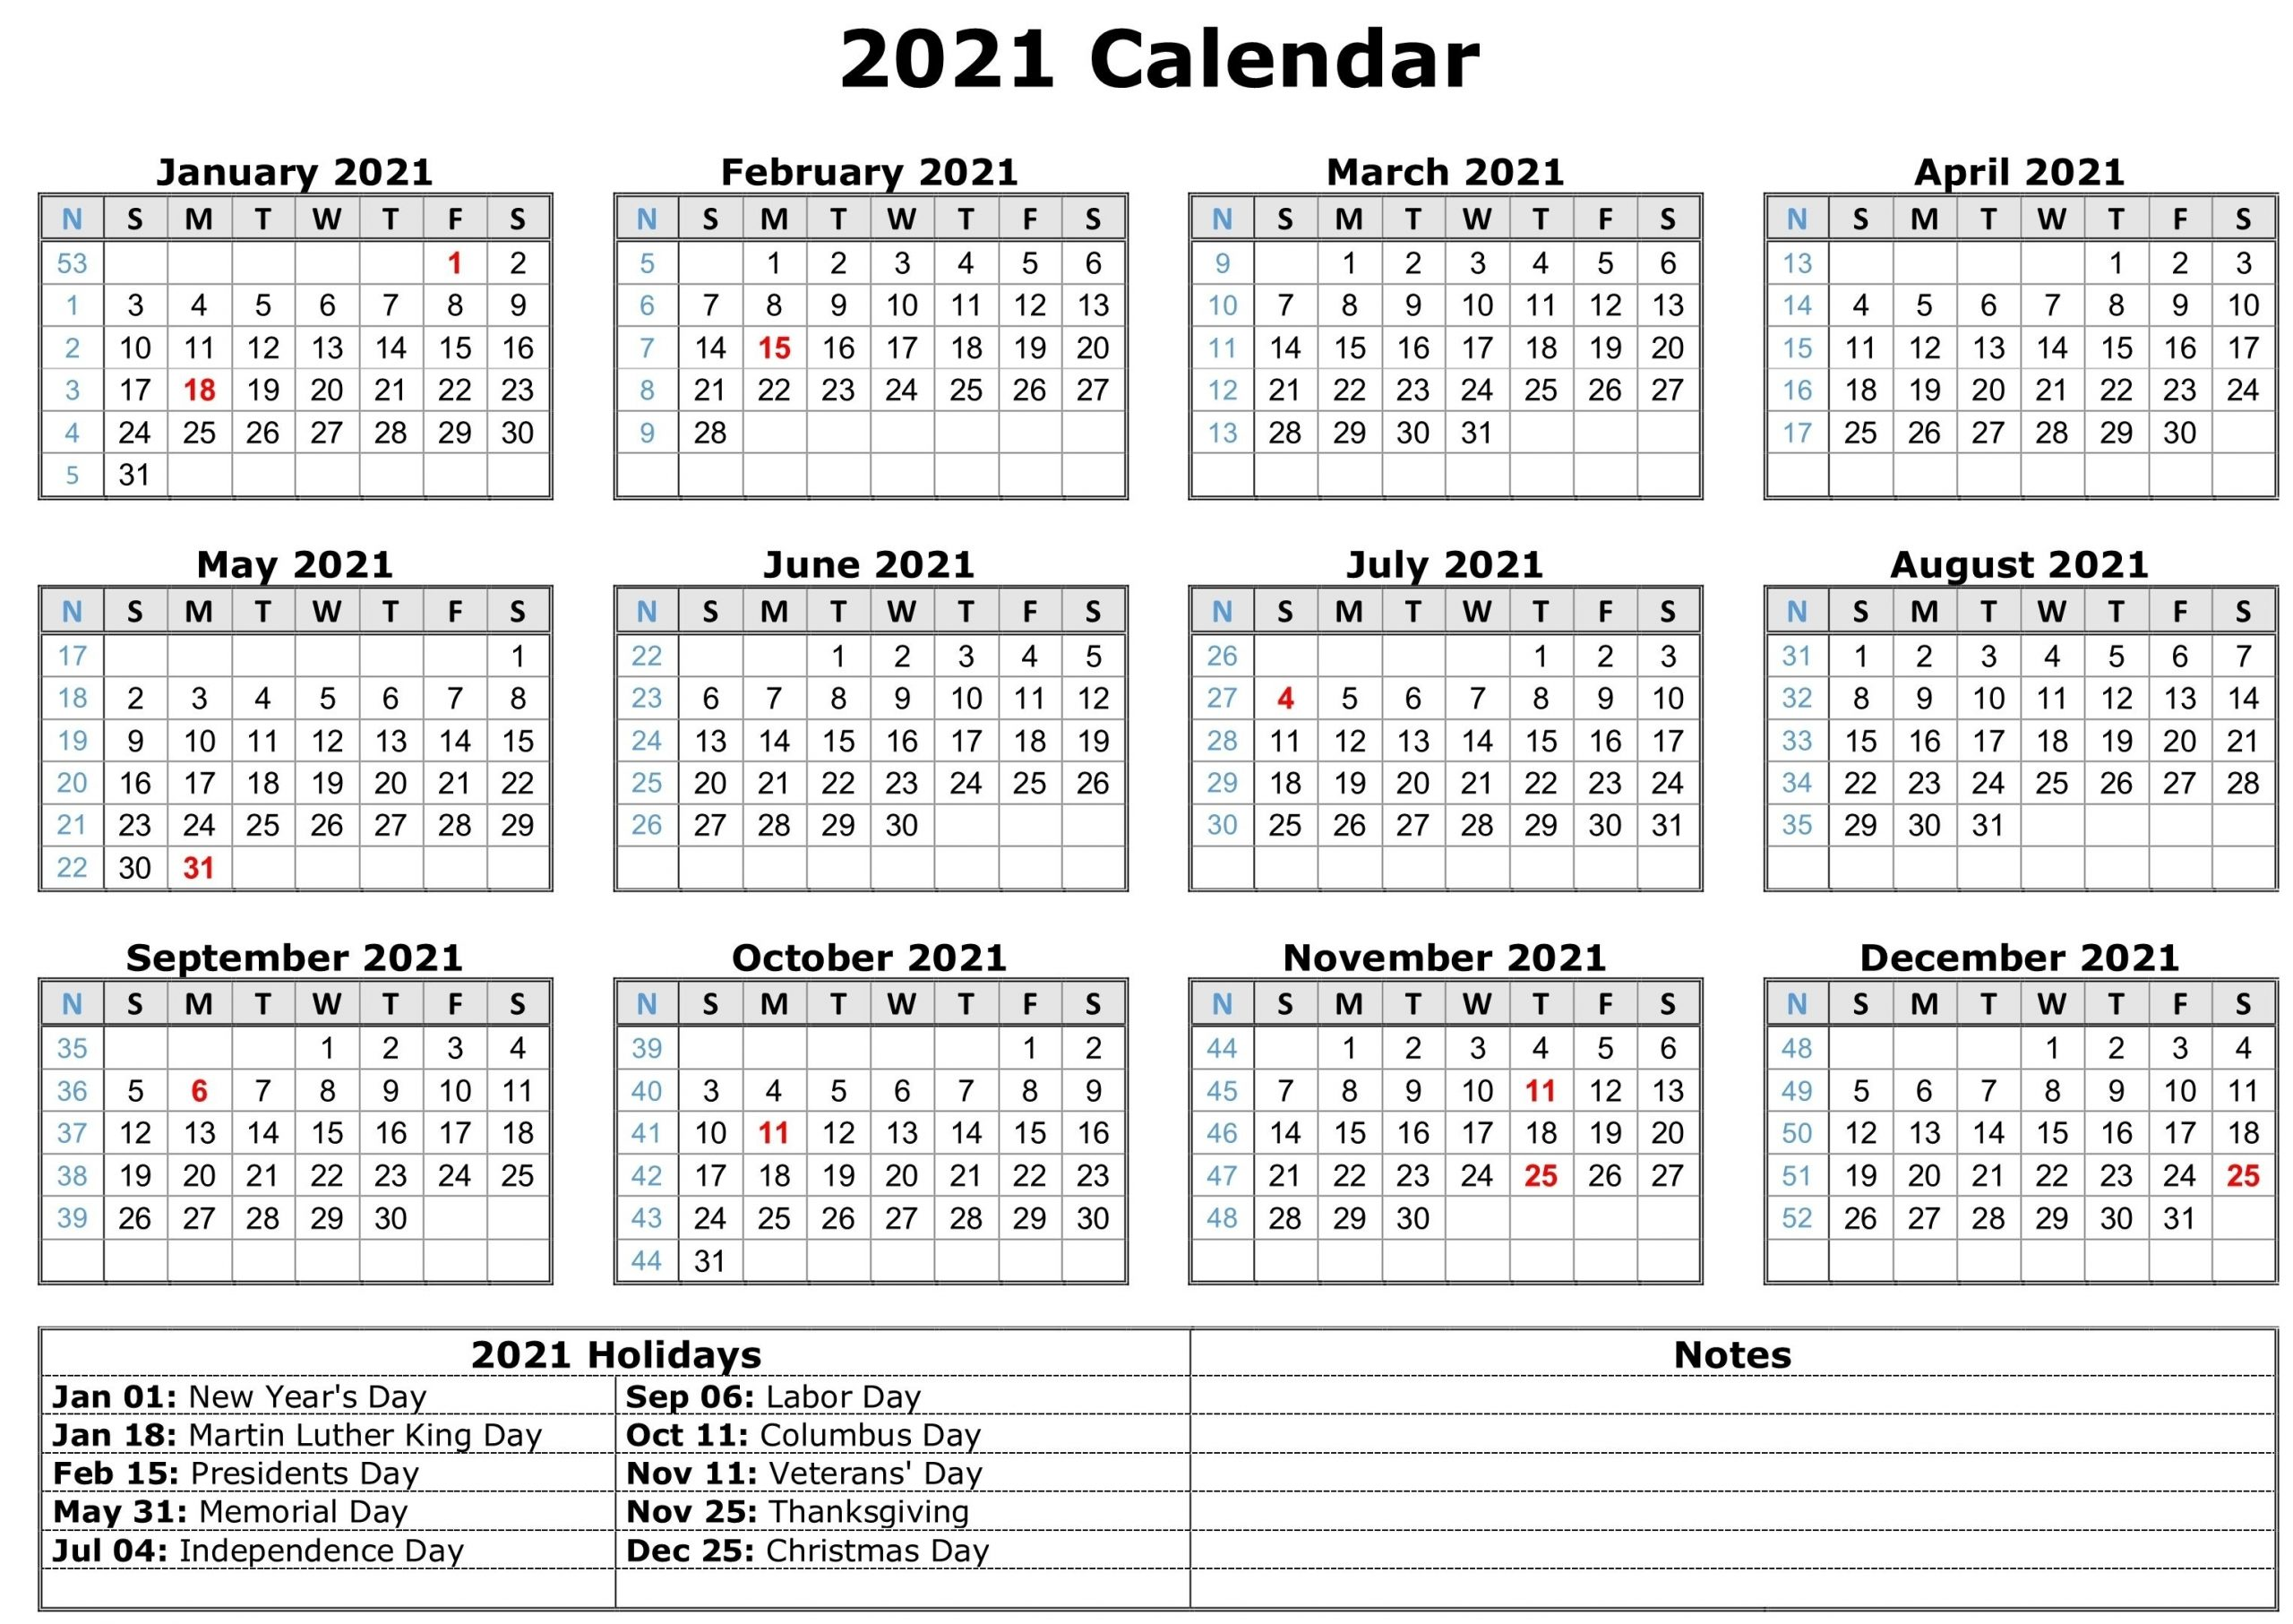 Get Free Printable 2021 Calendar